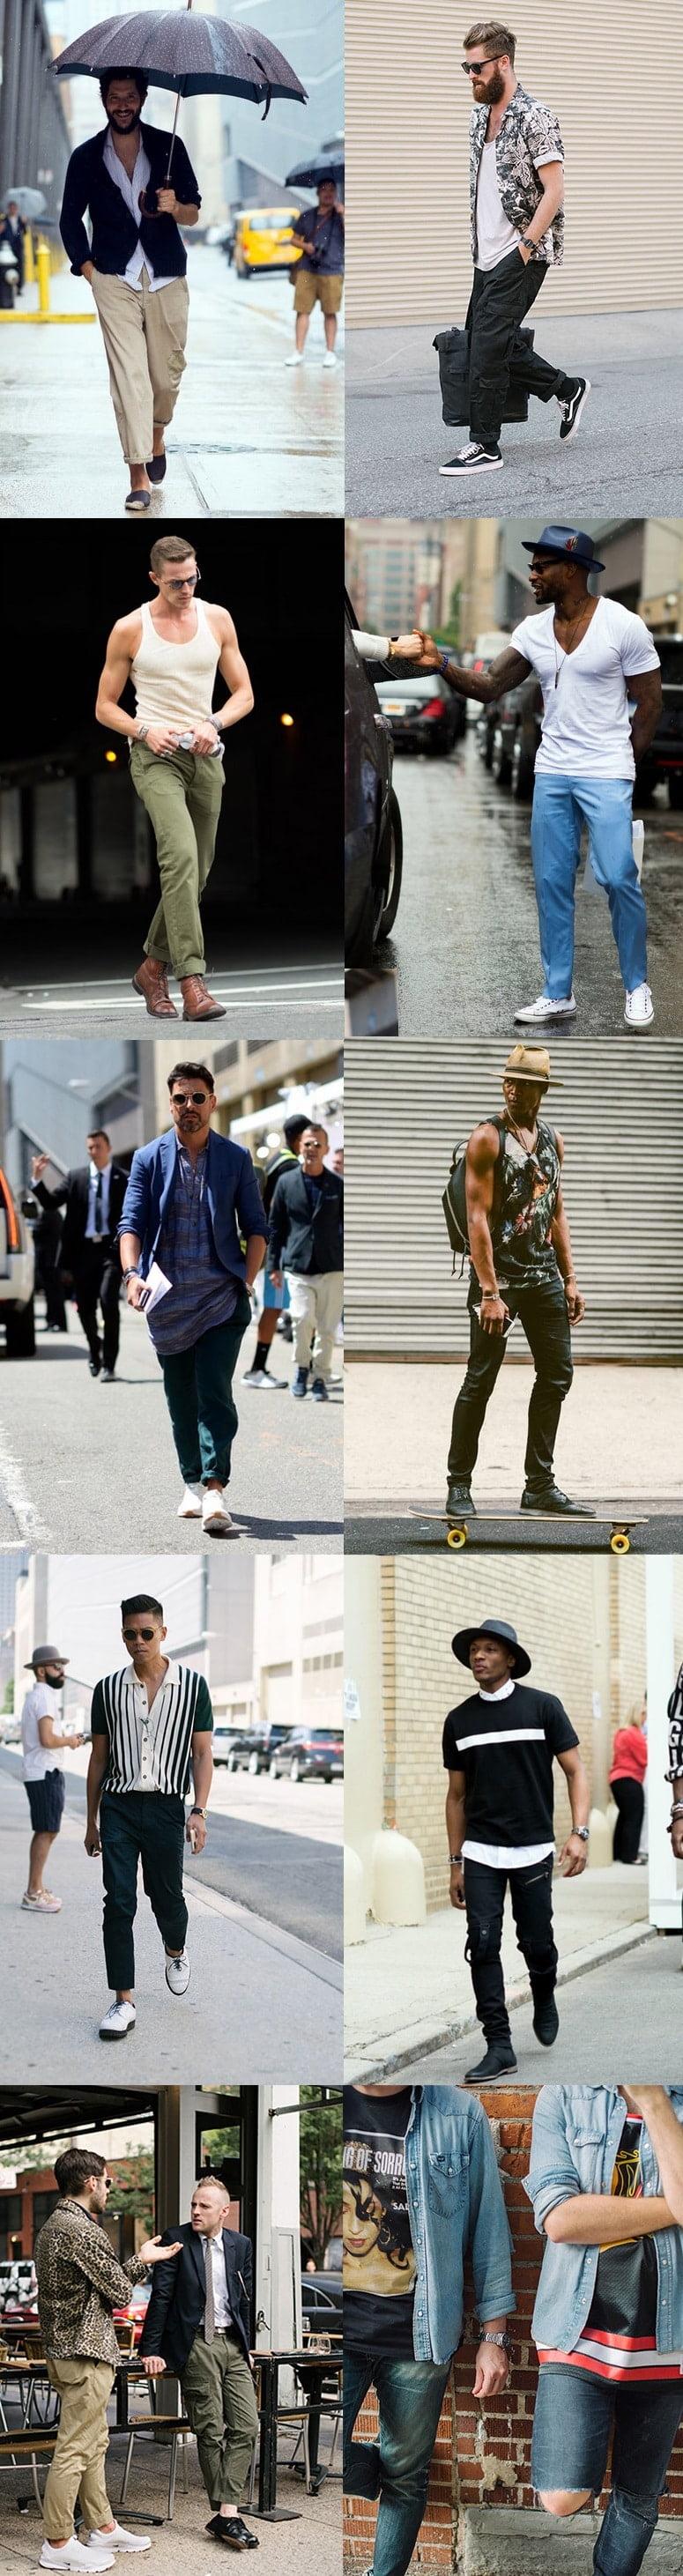 Street Style da semana de moda de NY - New York Men's Fashion Week Homens que se cuidam 3